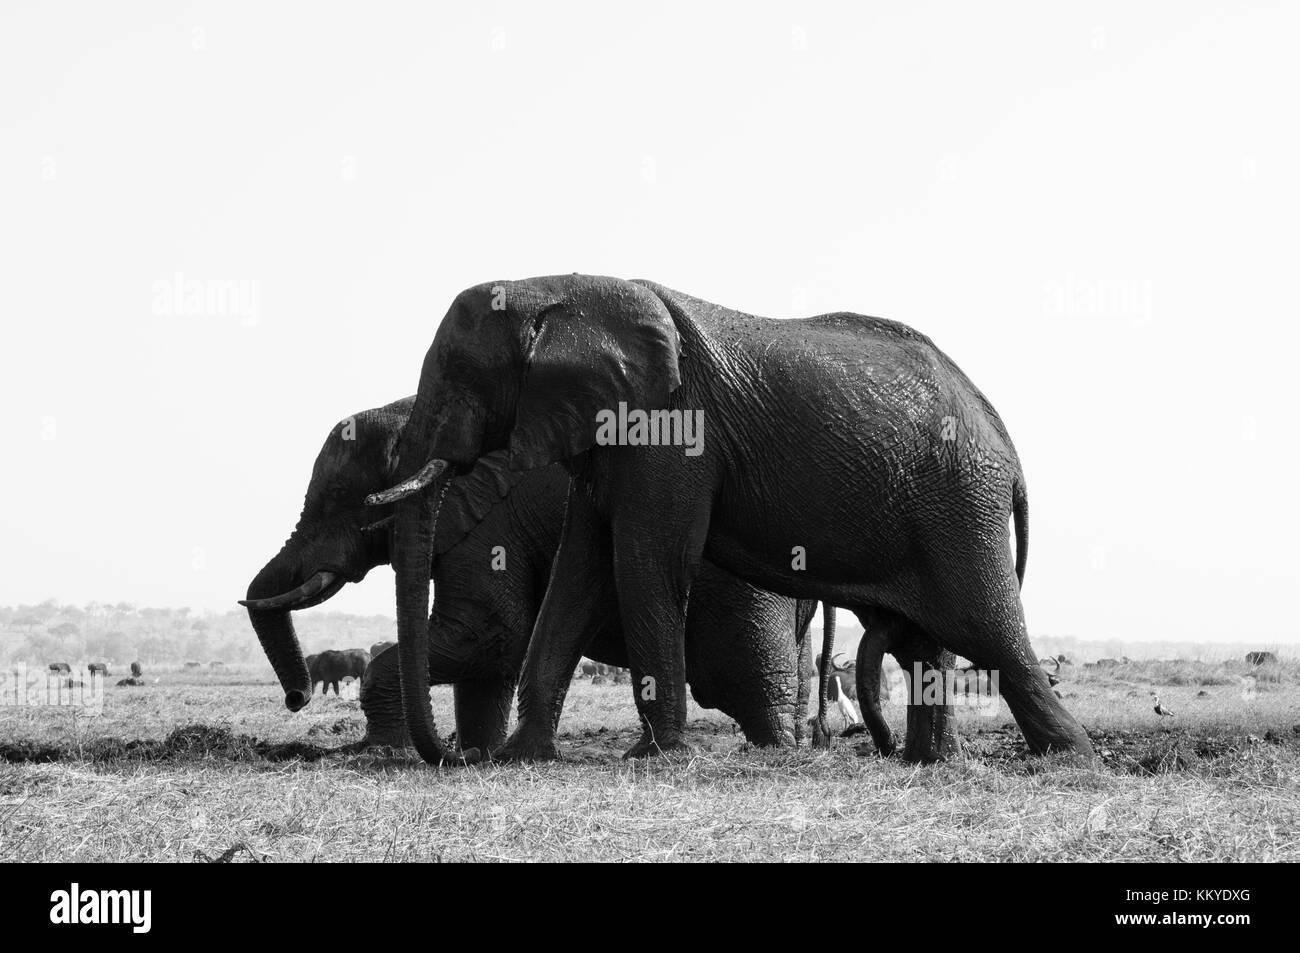 Elephants (Loxodonta africana), Chobe National Park, Botswana. - Stock Image